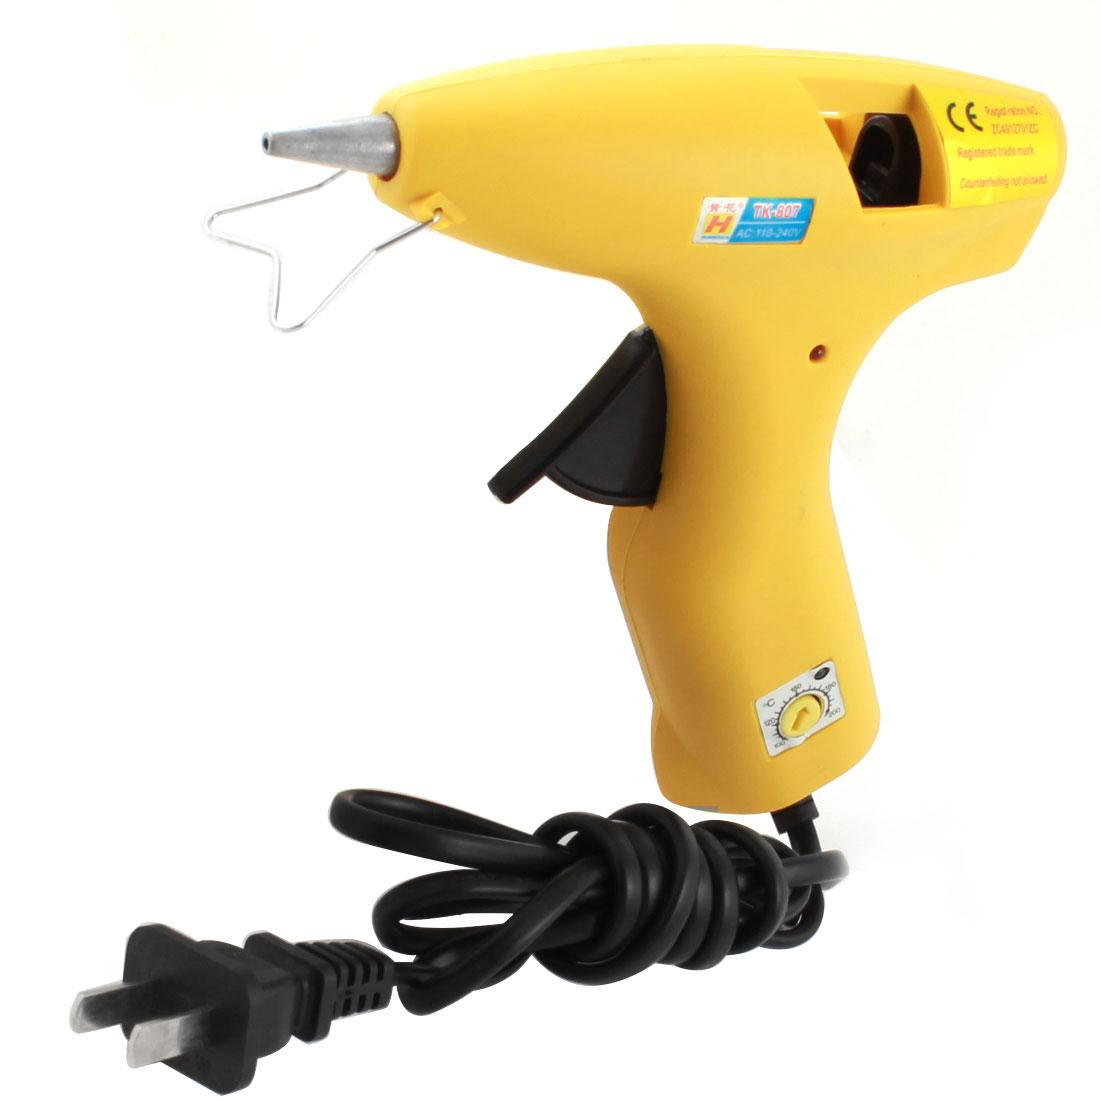 AC 110-240V US Plug 100C-200C Temperature Range Hot Melt Glue Gun 30W TK-807